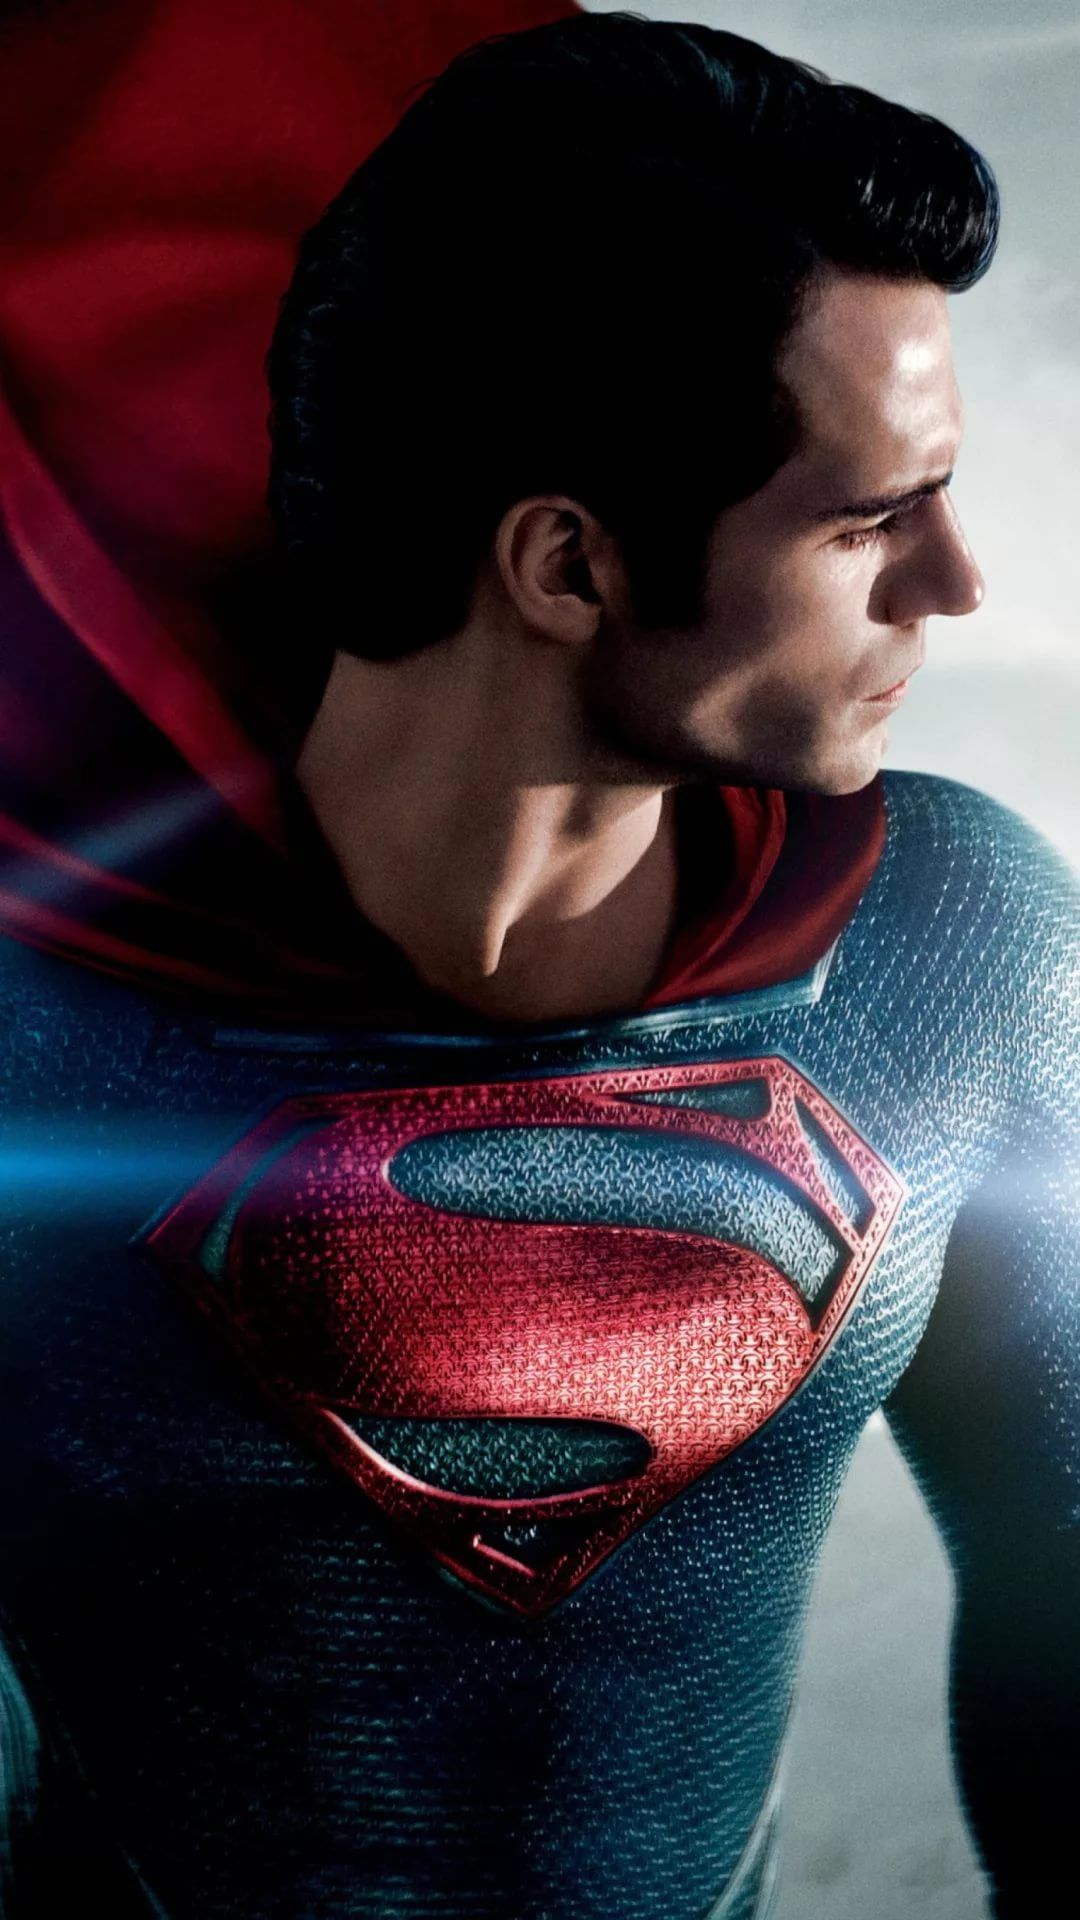 Superman Wallpaper for Phone